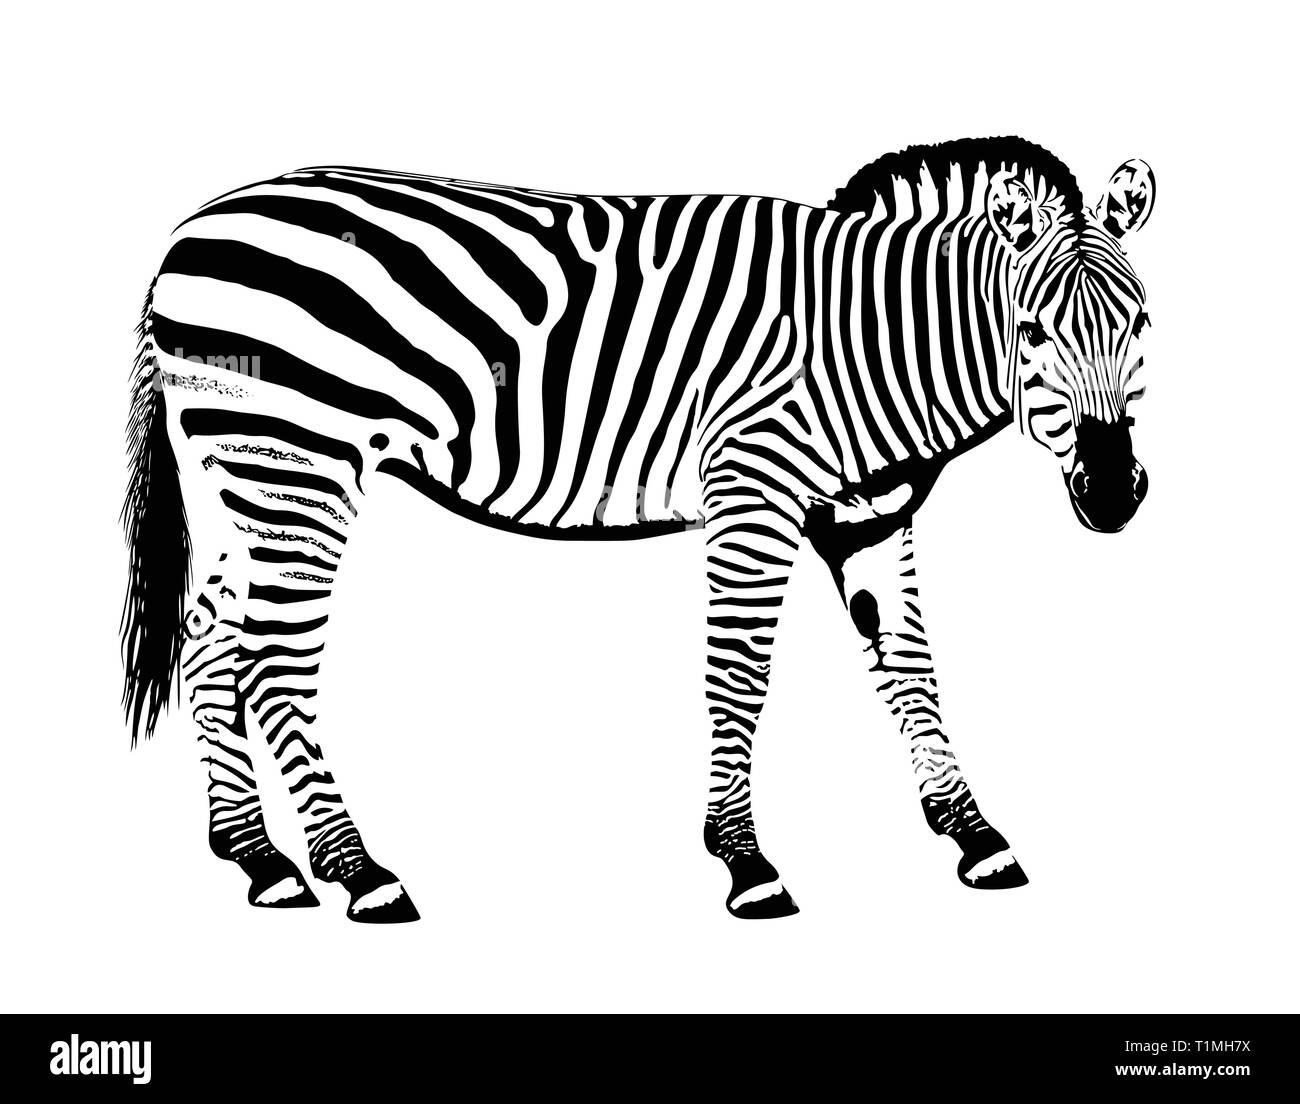 Zebra animal stencil mask hand drawn vector illustration - Stock Image